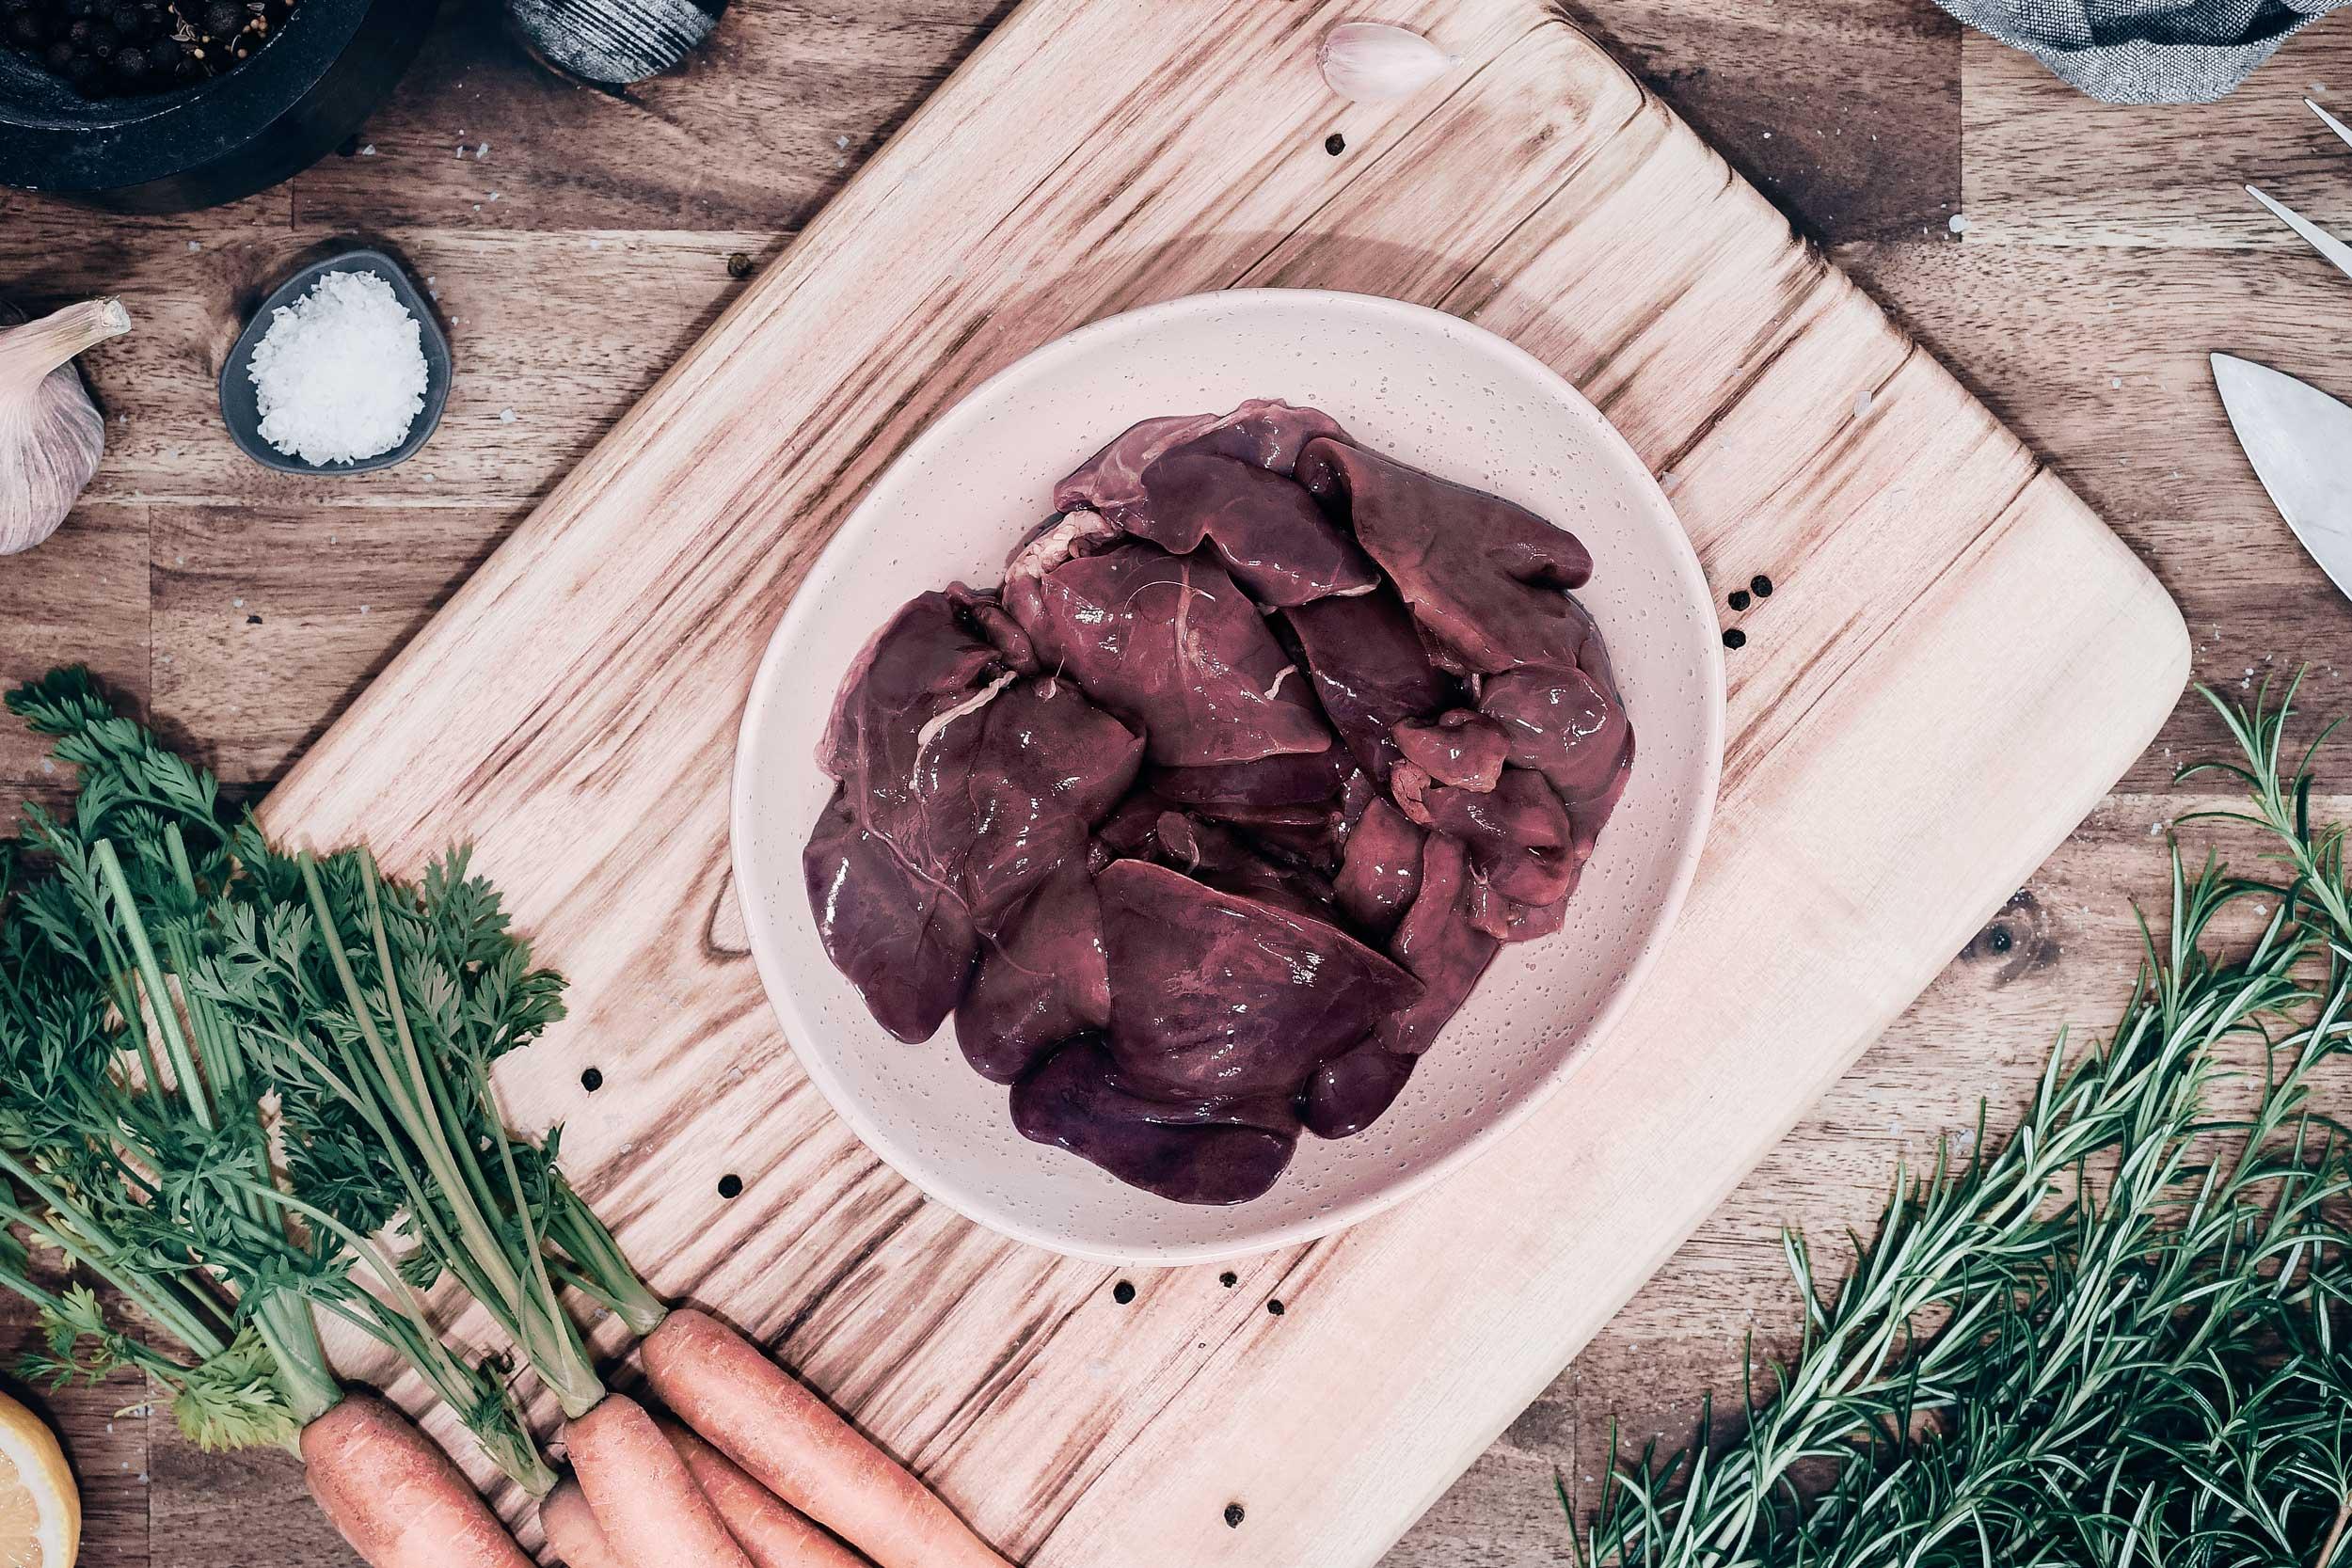 Topi Open Range Chef's Cuts - Chicken Livers